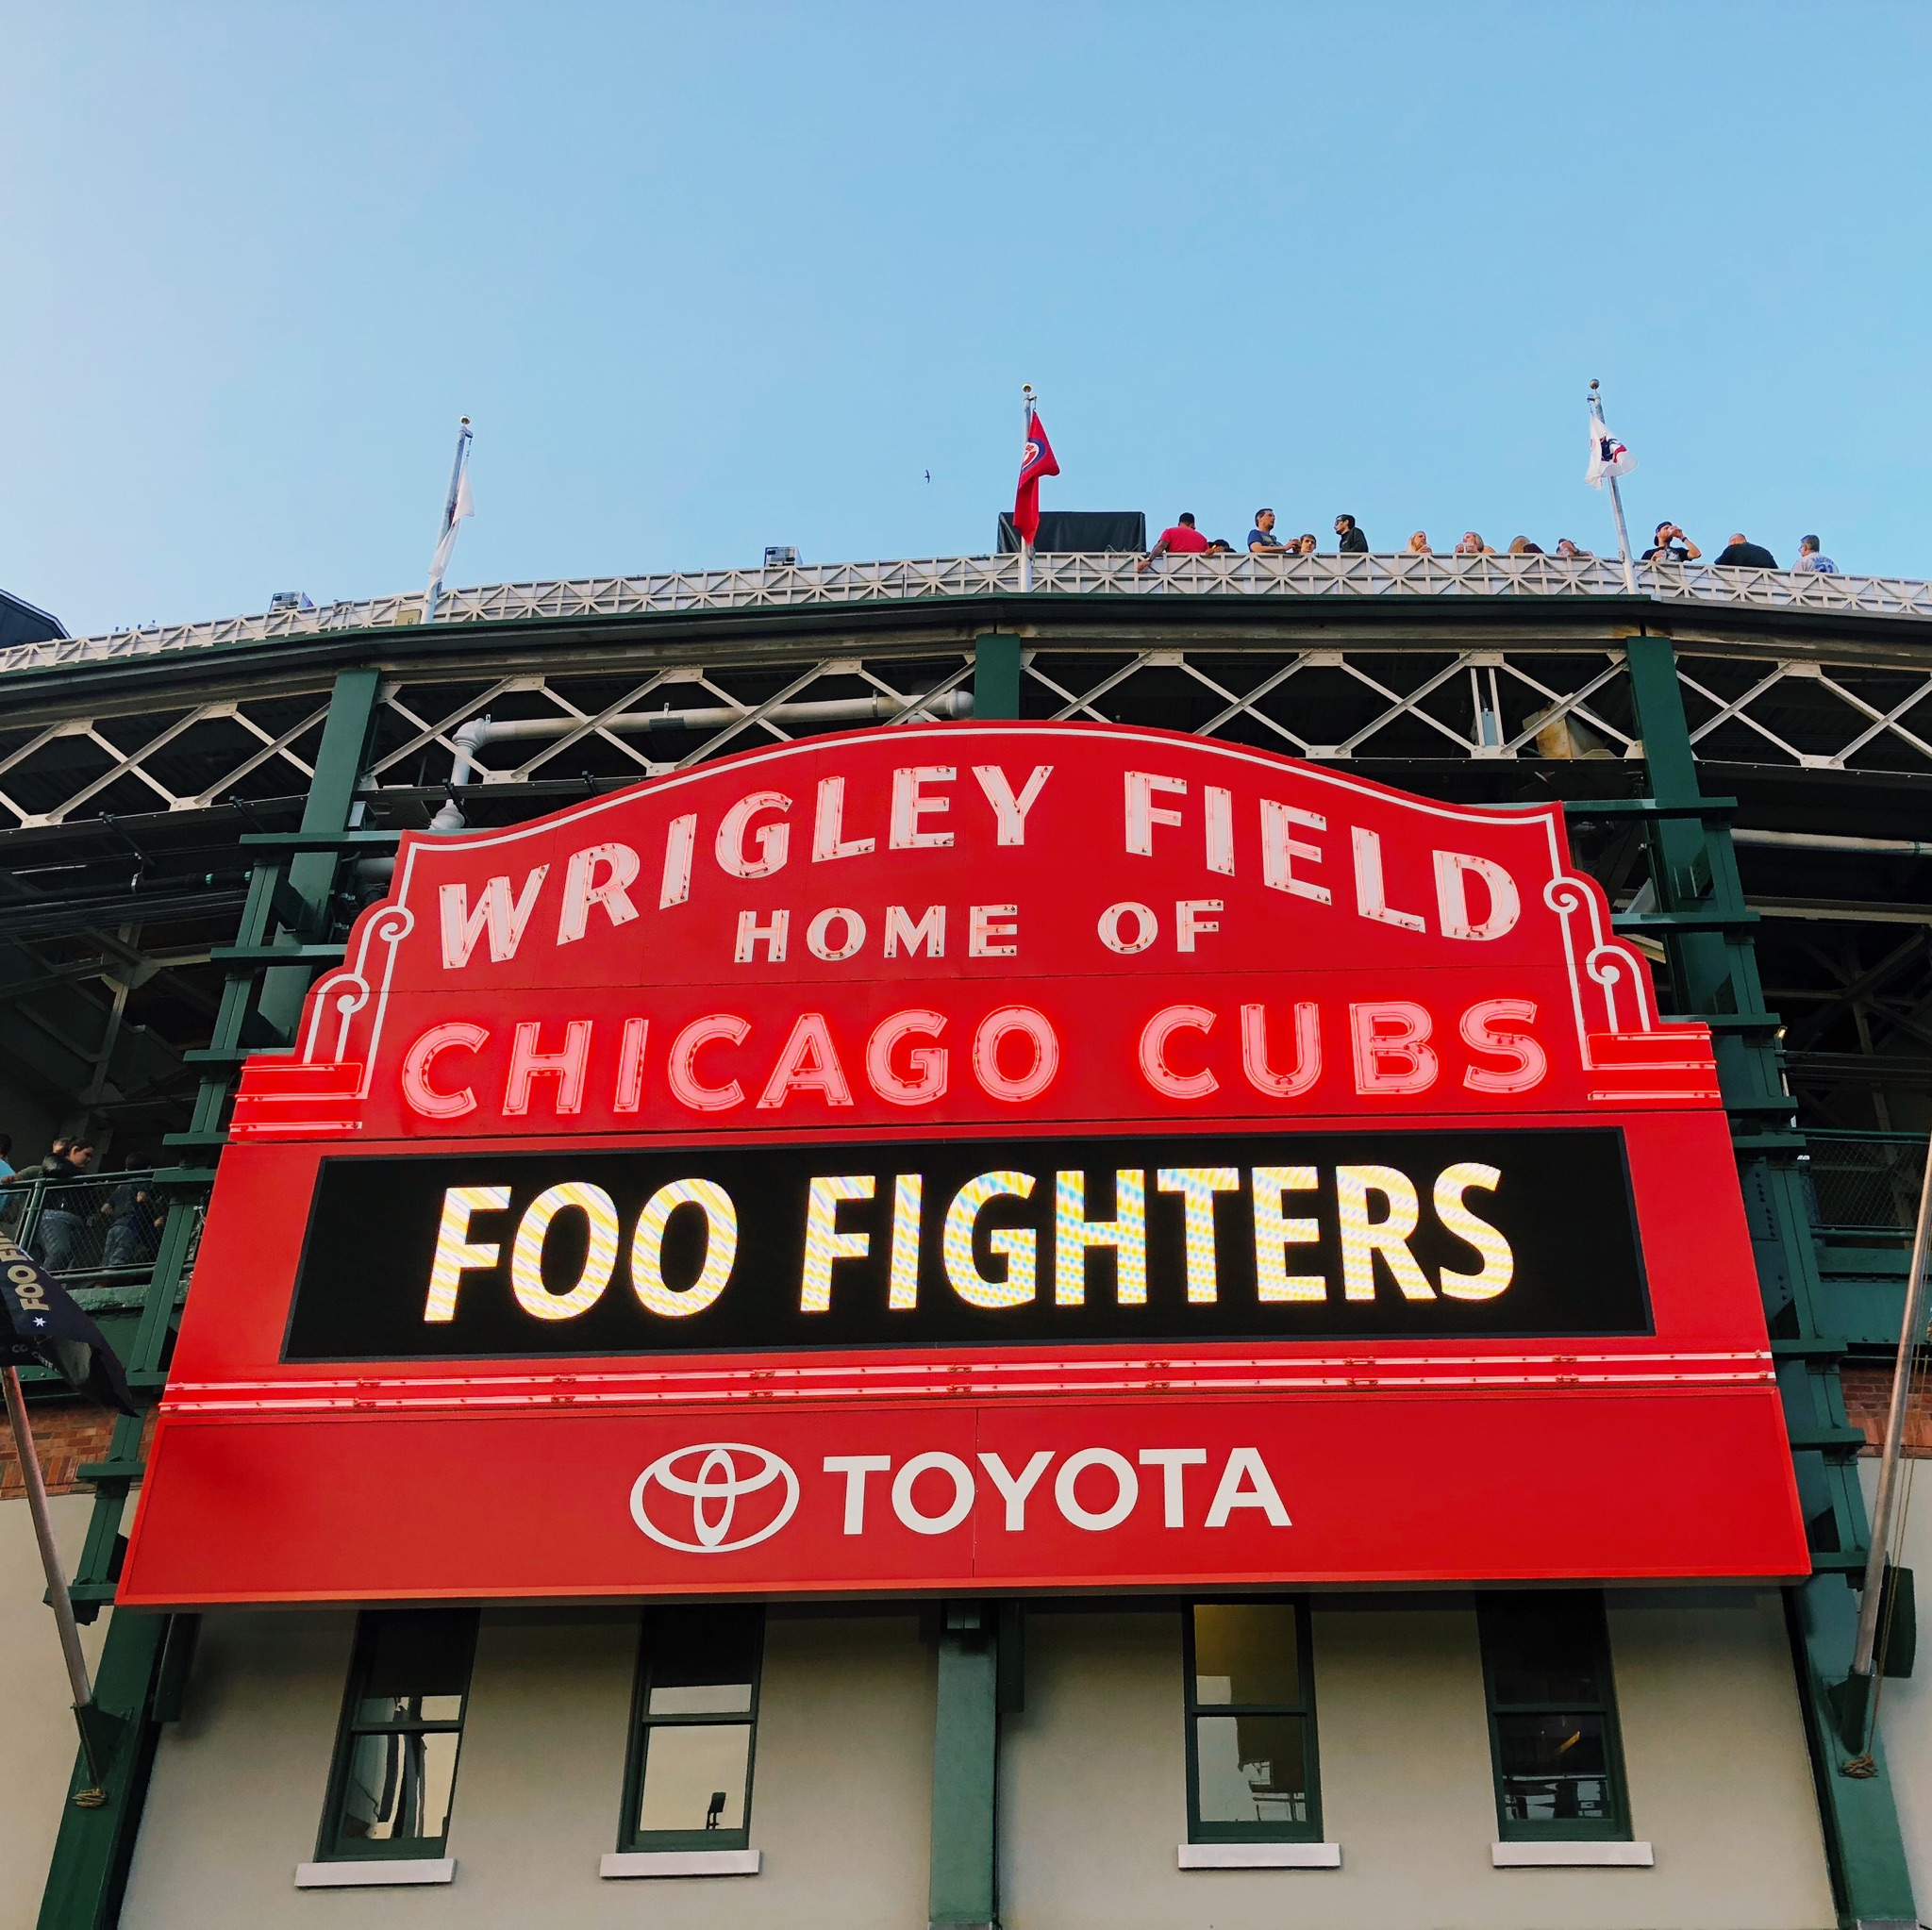 foo-fighters-wrigley-field-chicago.jpeg